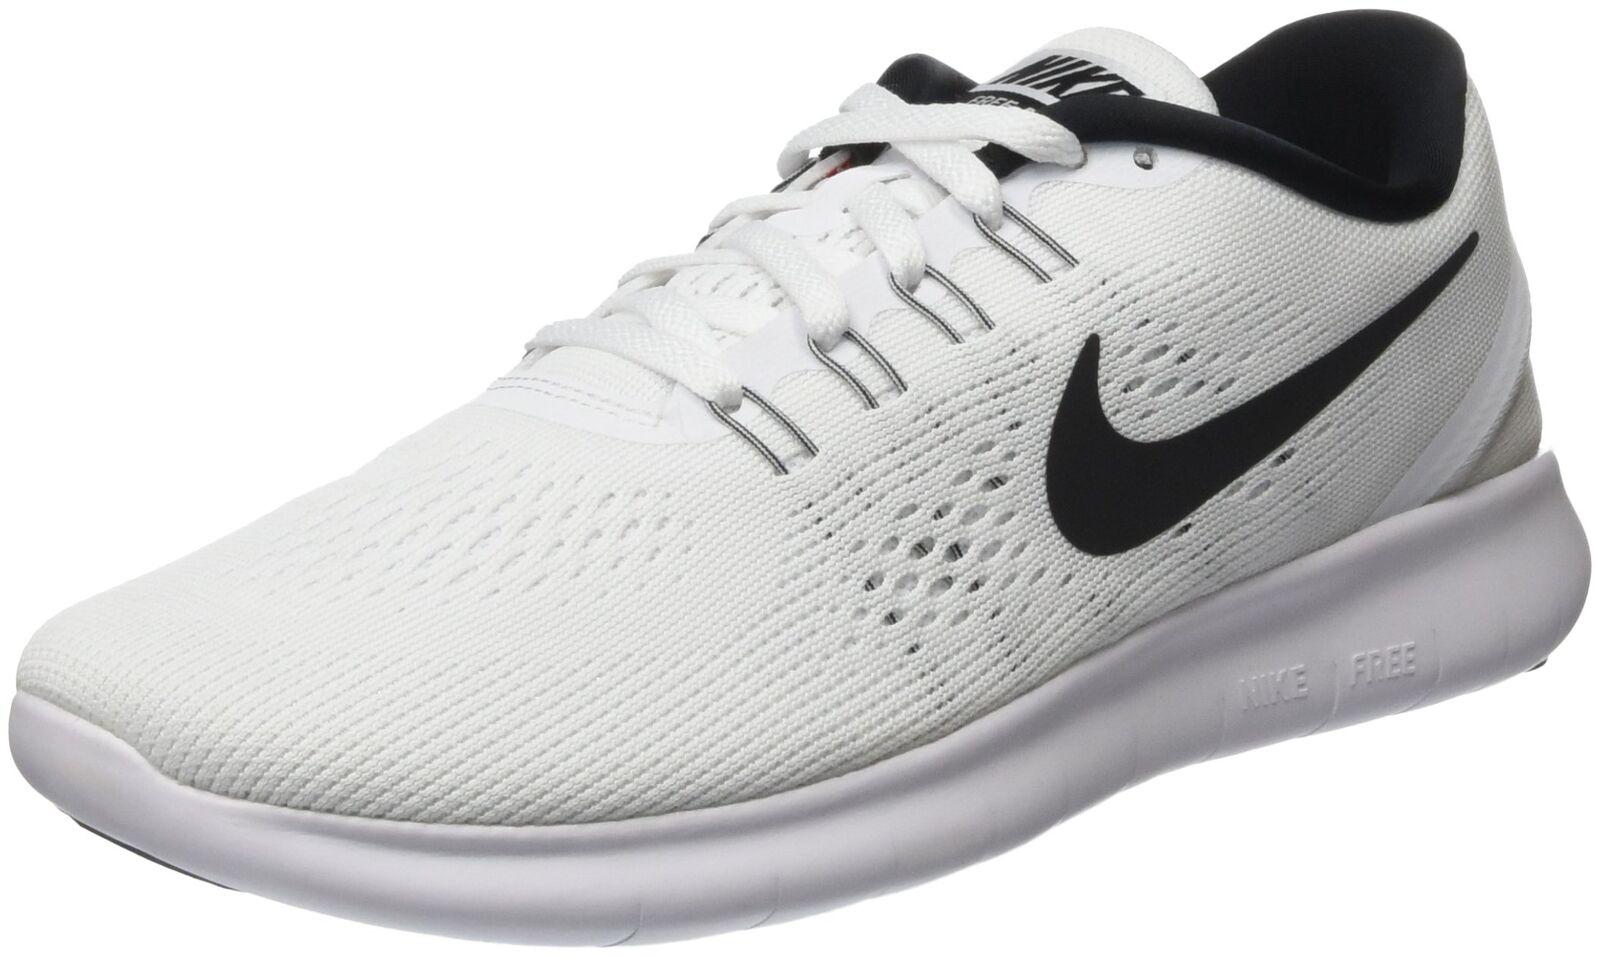 NIKE Men's Free RN Running Shoe White/Black 12 D(M) US